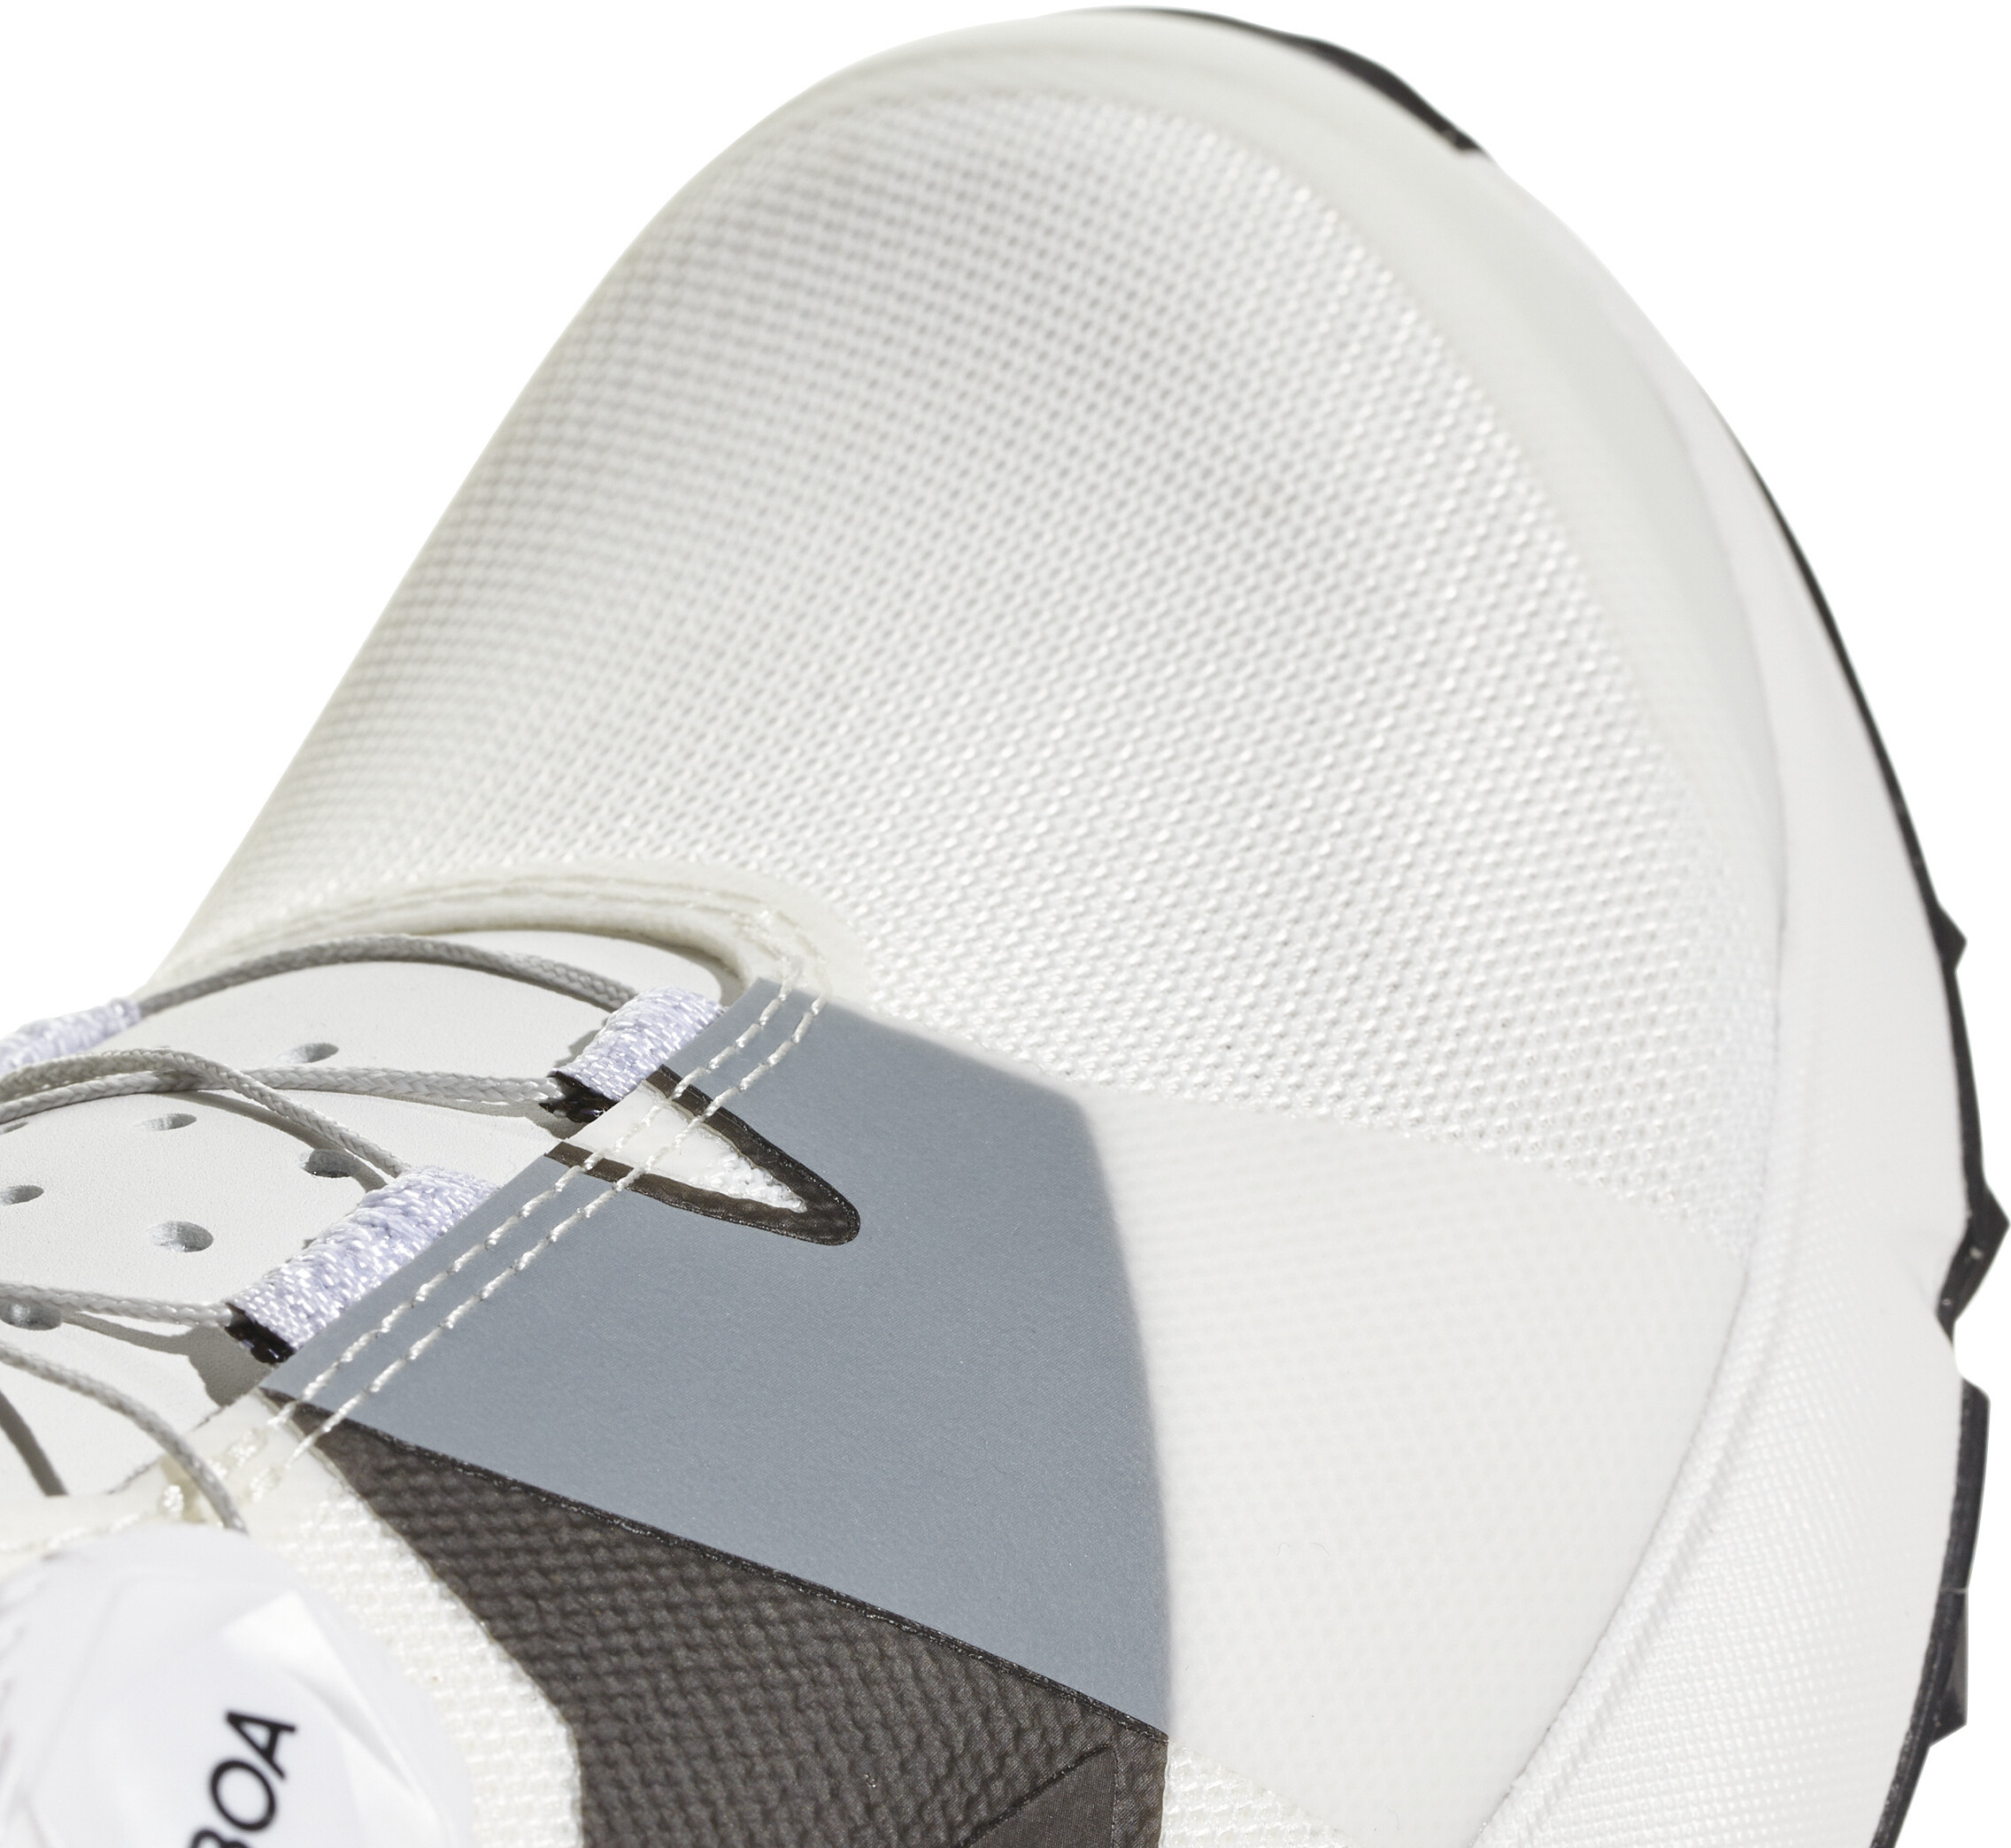 separation shoes 2bf14 c3a37 adidas TERREX Two Boa - Zapatillas running Hombre - blanco negro